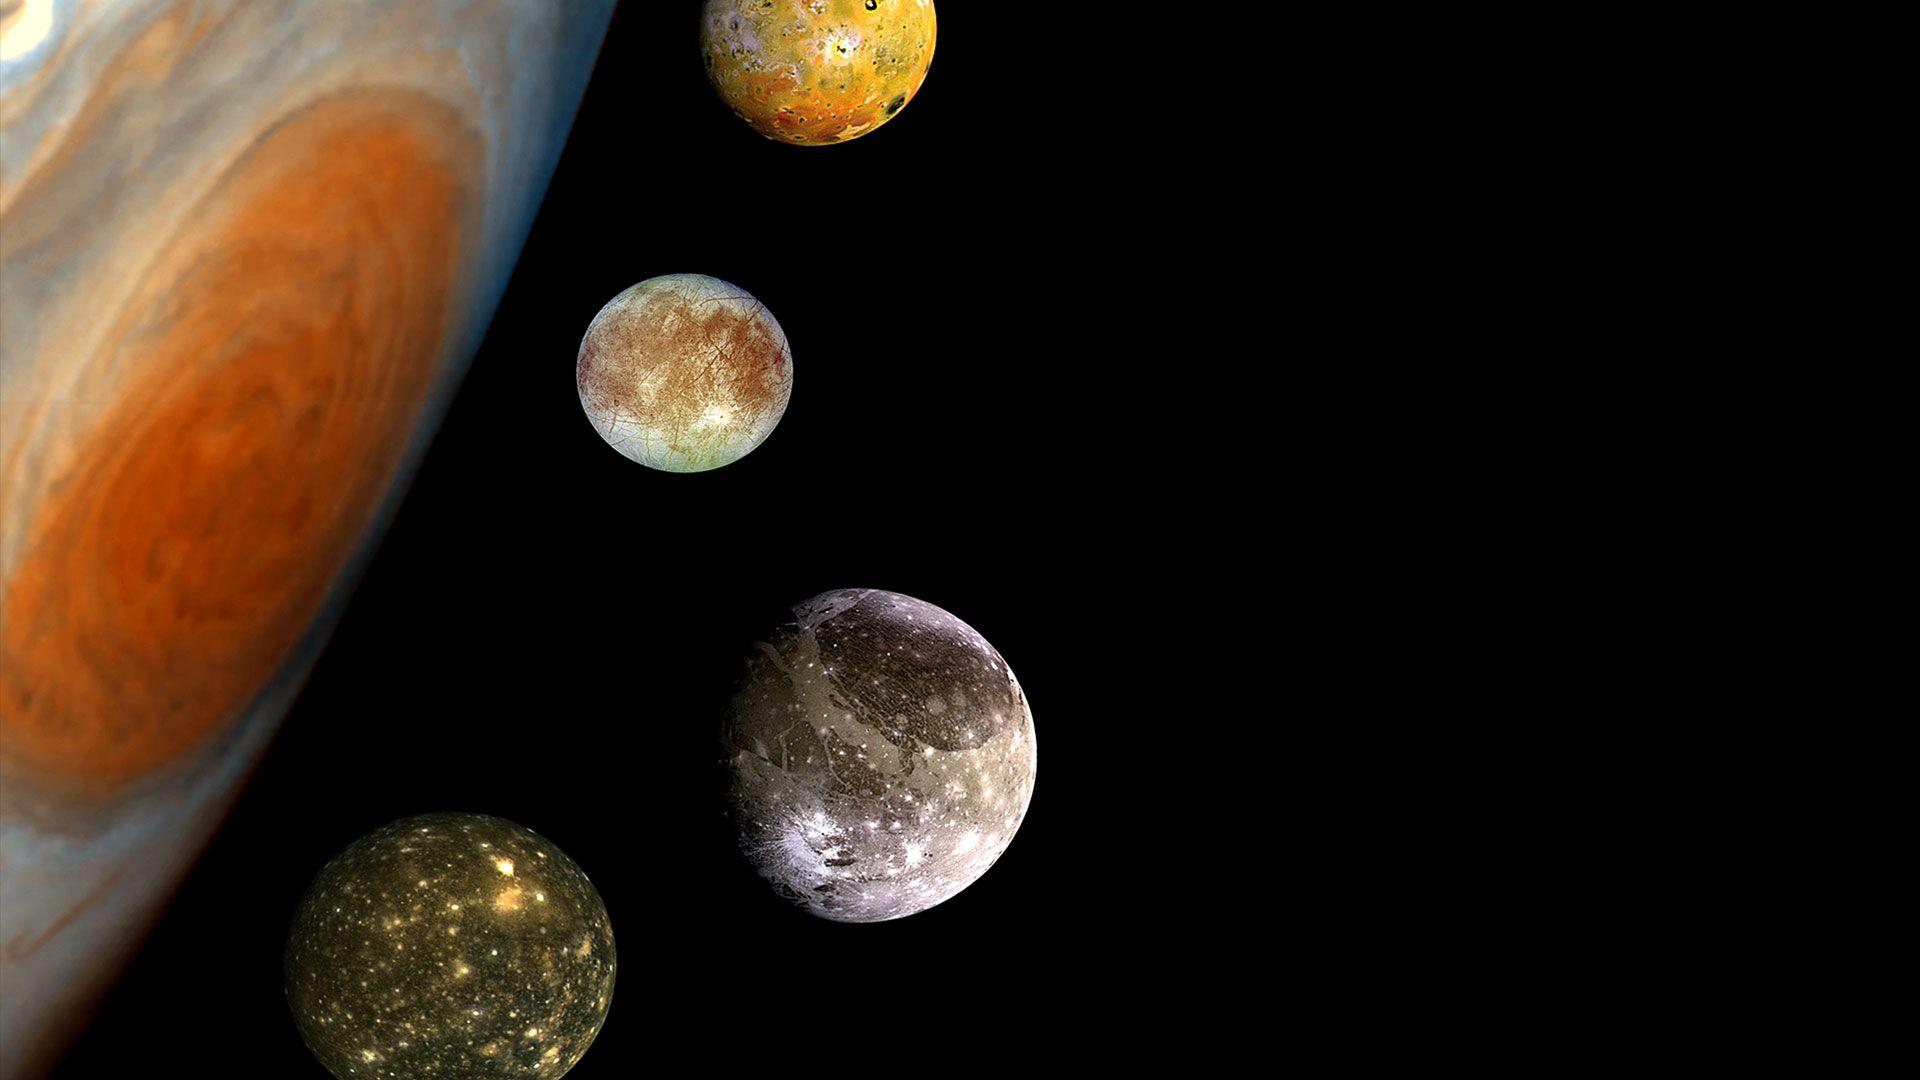 Jupiter ja Jupiterin neljä suurinta kuuta. Kuva: Yle kuvapalvelu/Robesus Inc.